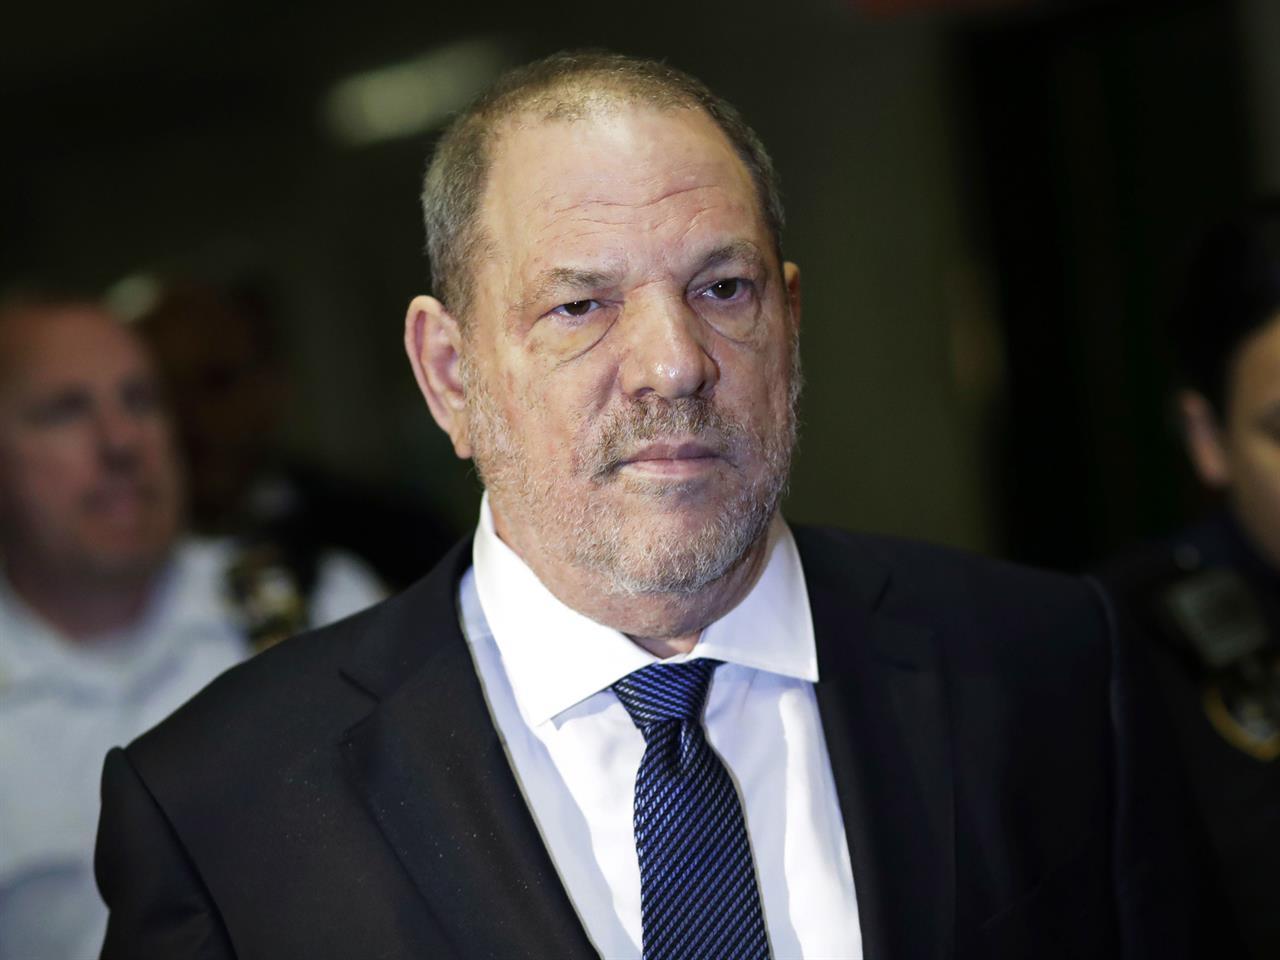 Legal questions loom as Harvey Weinstein case nears trial